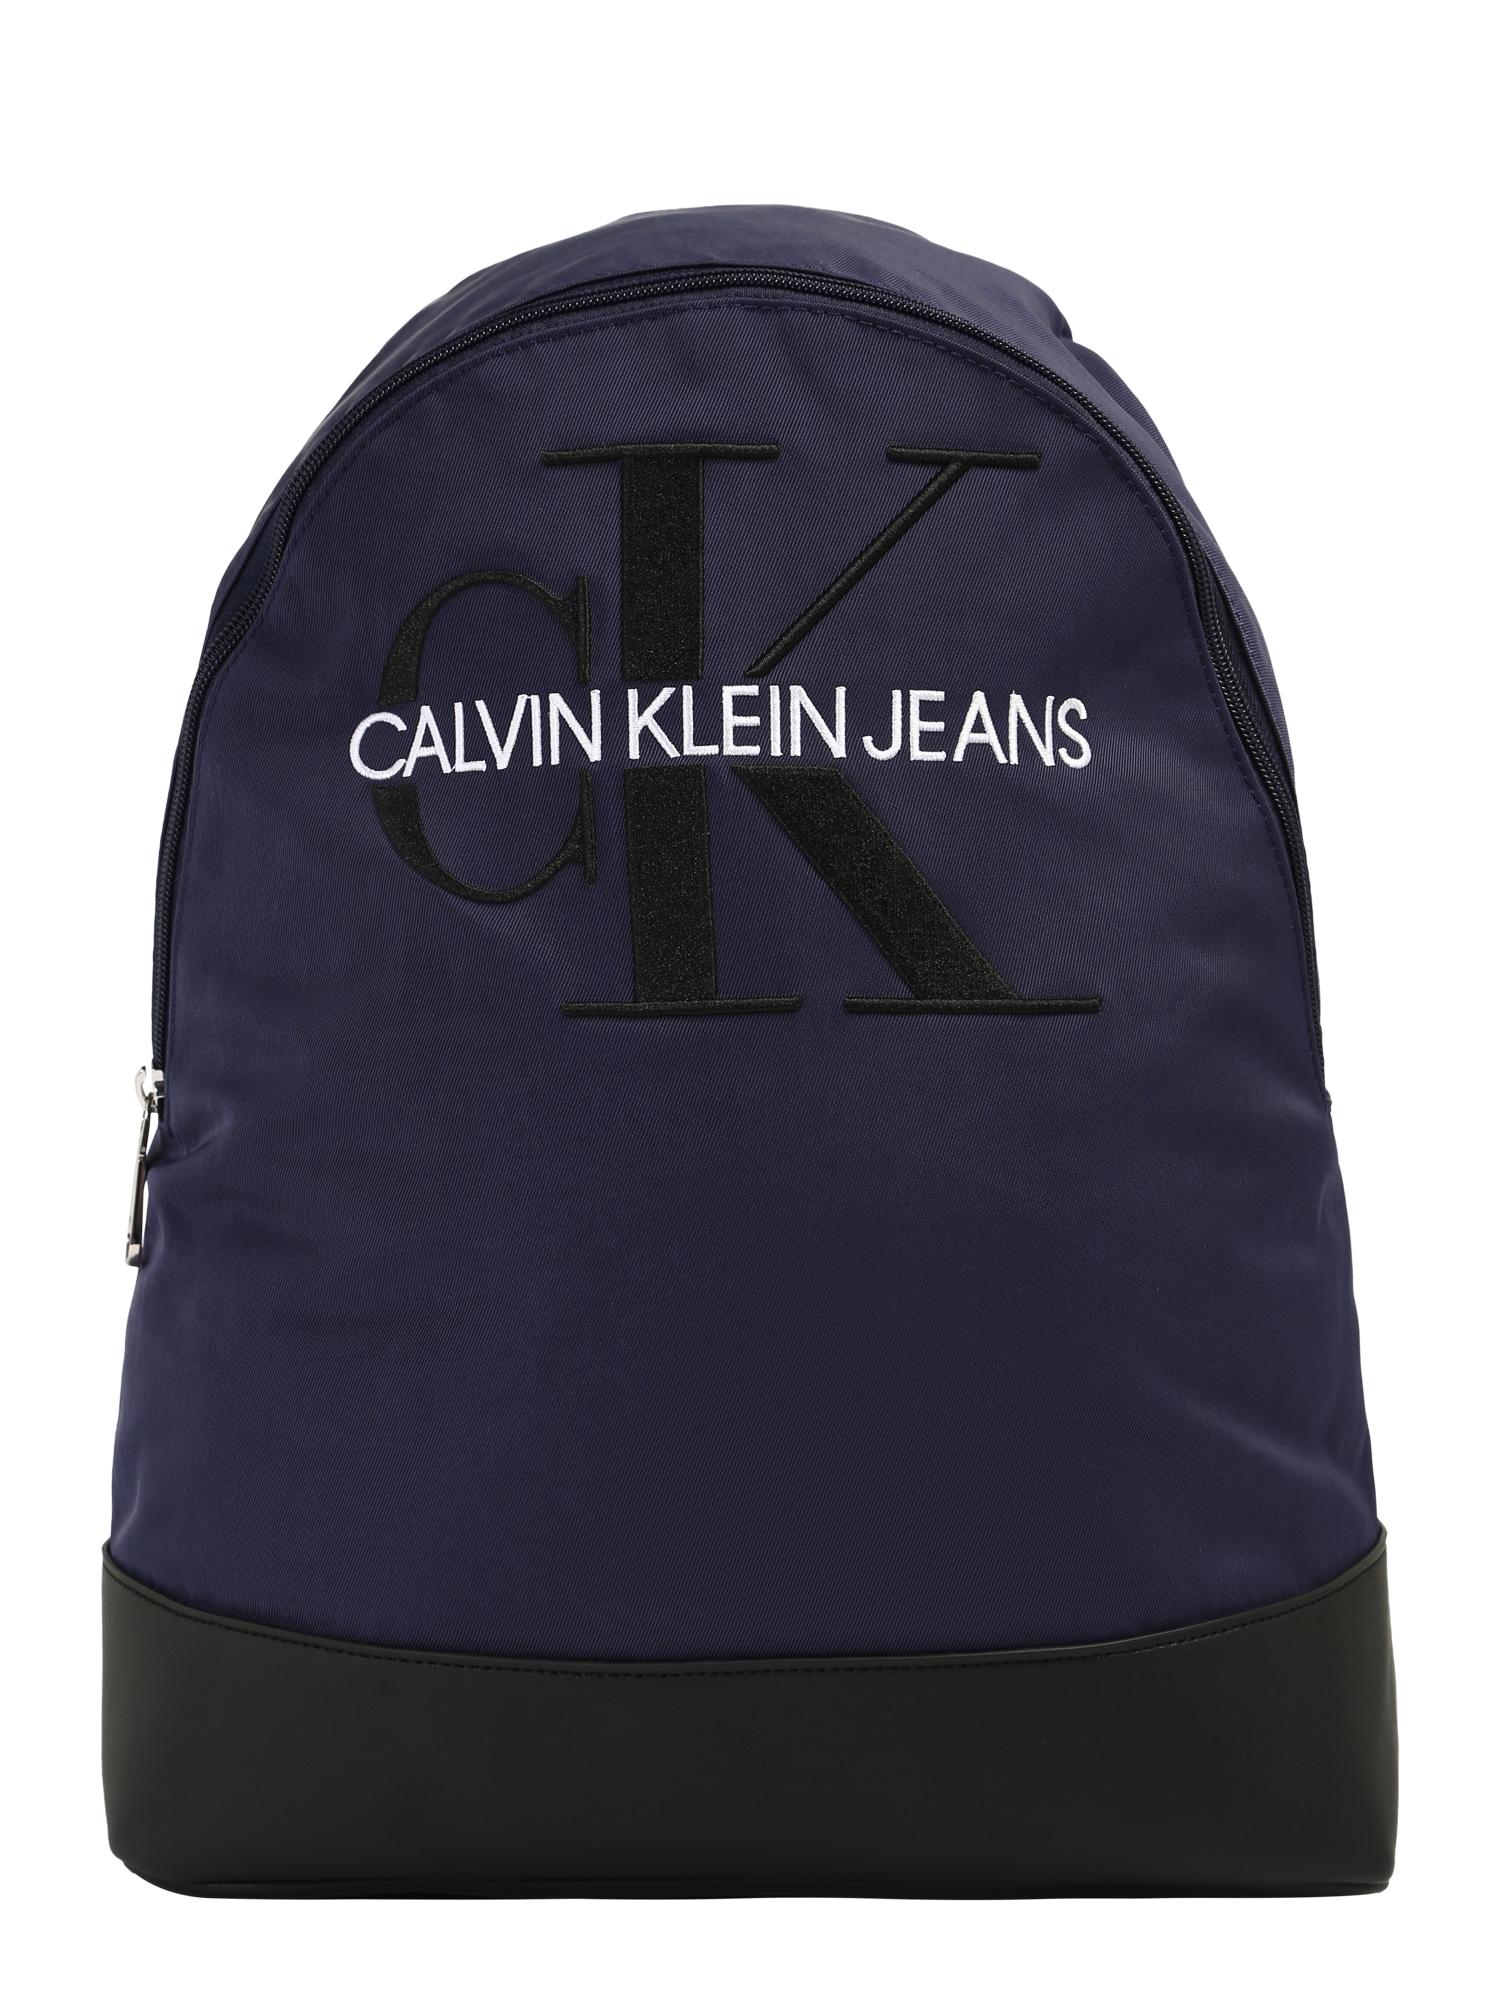 Calvin Klein Jeans Batoh 'MONOGRAM'  námořnická modř